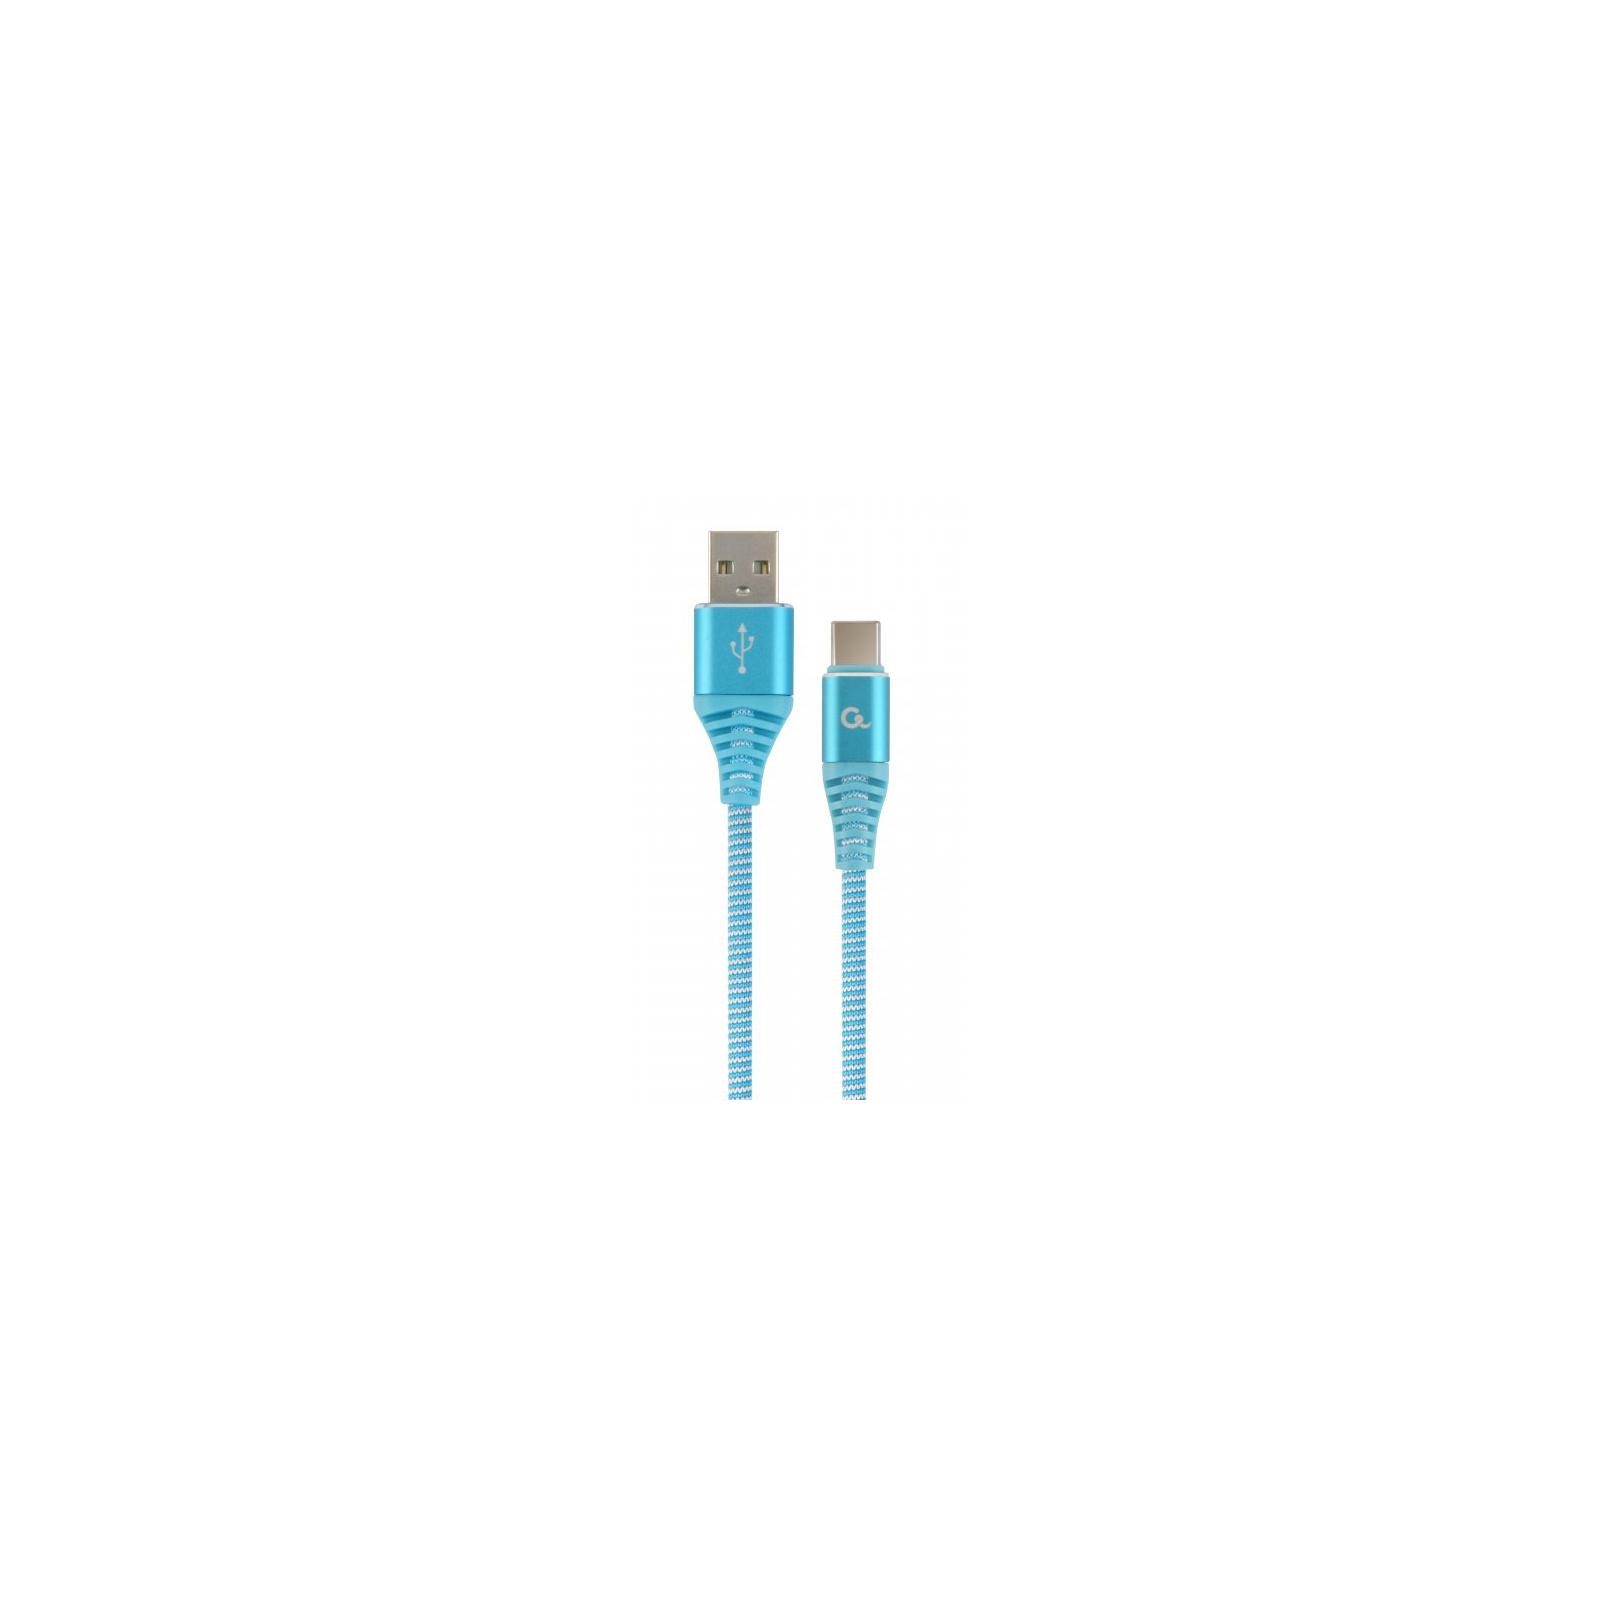 Дата кабель USB 2.0 AM to Type-C 1.0m Cablexpert (CC-USB2B-AMCM-1M-PW)